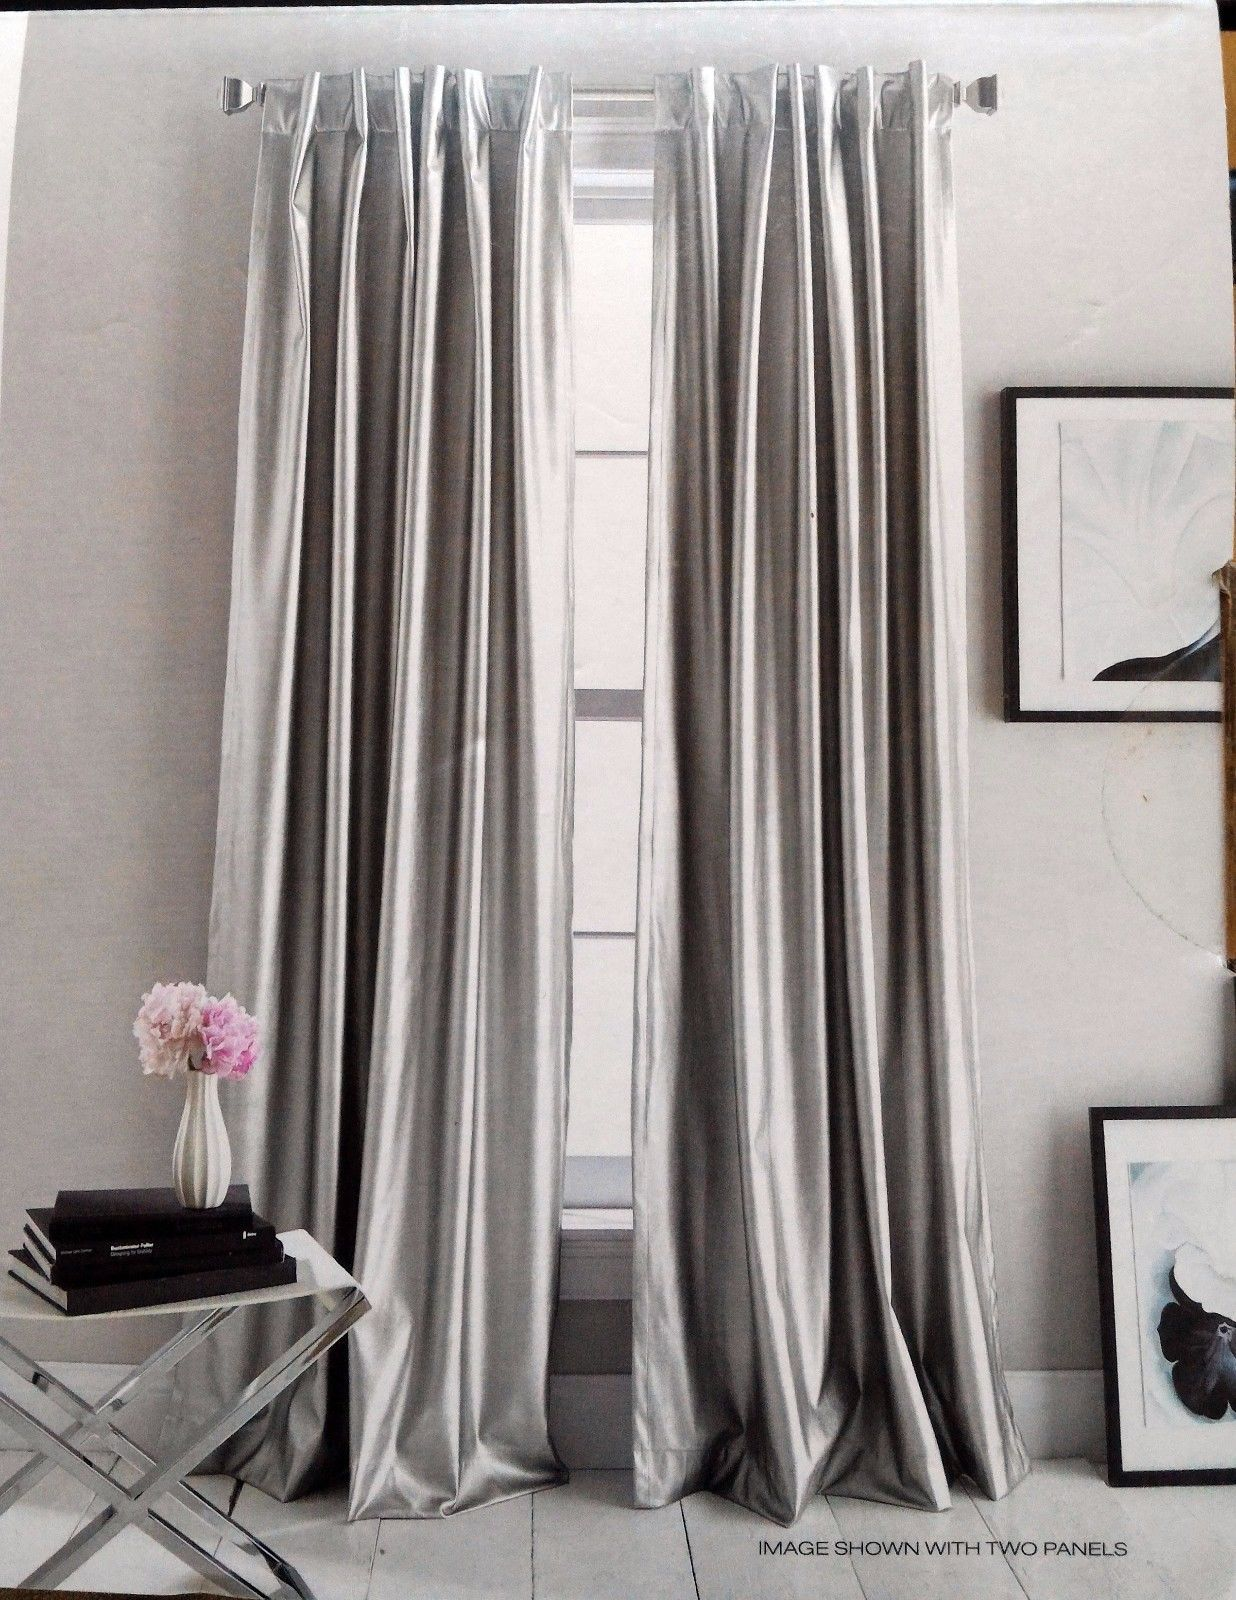 Dkny Matte Gray City Slate Faux Leather Dinning Room Table Decor Curtain Decor Window Decor